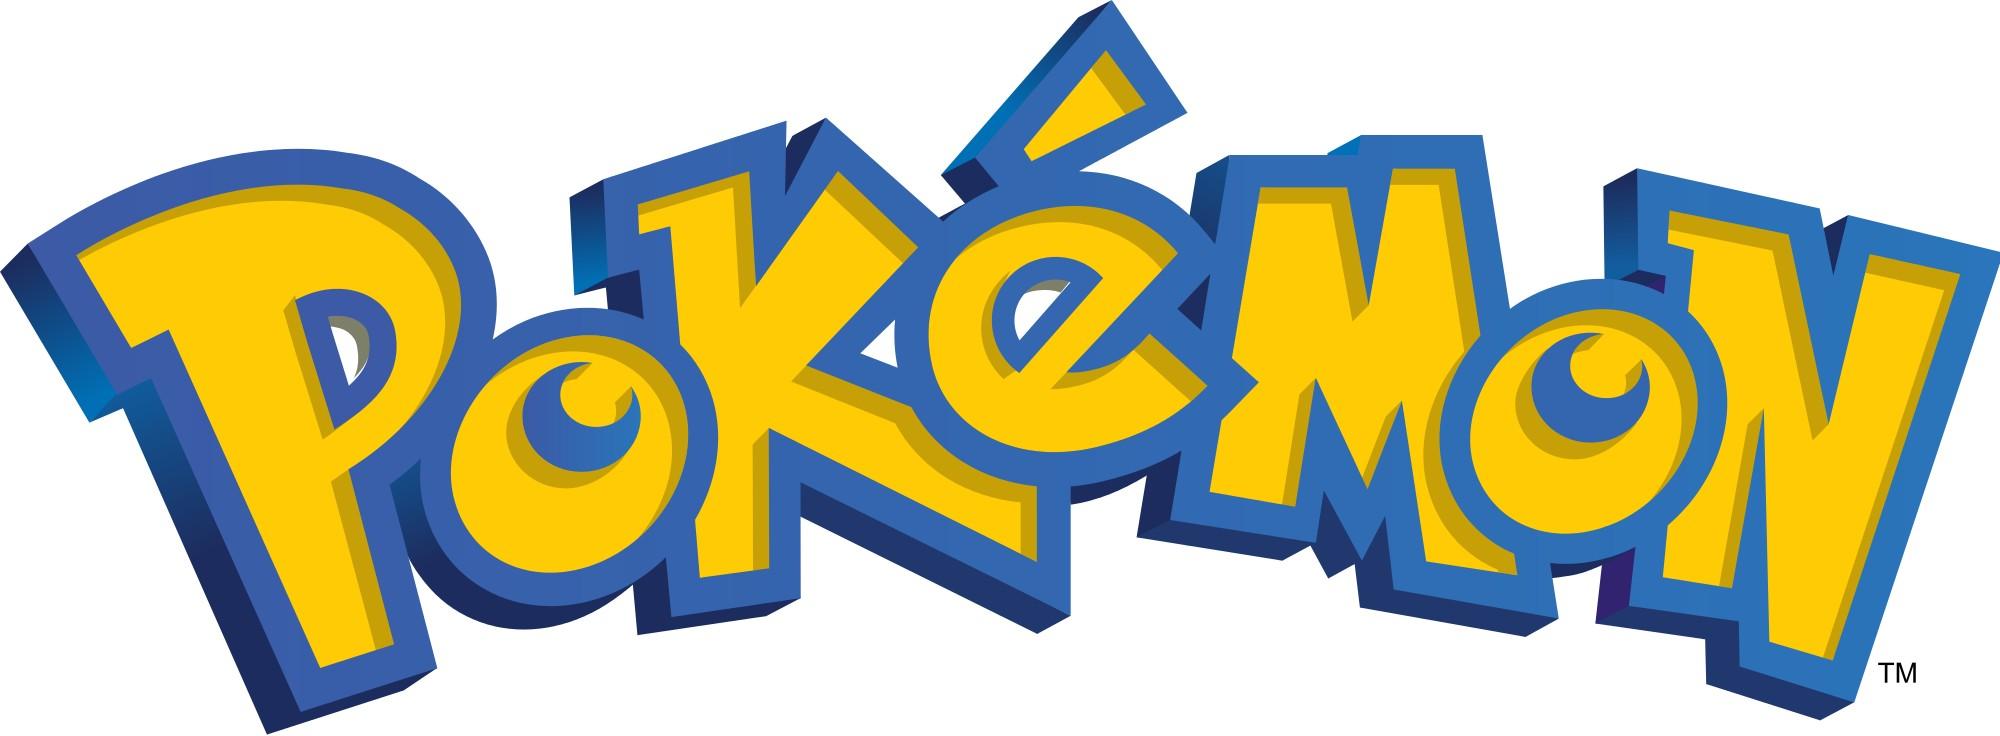 Les Pokémon - 1